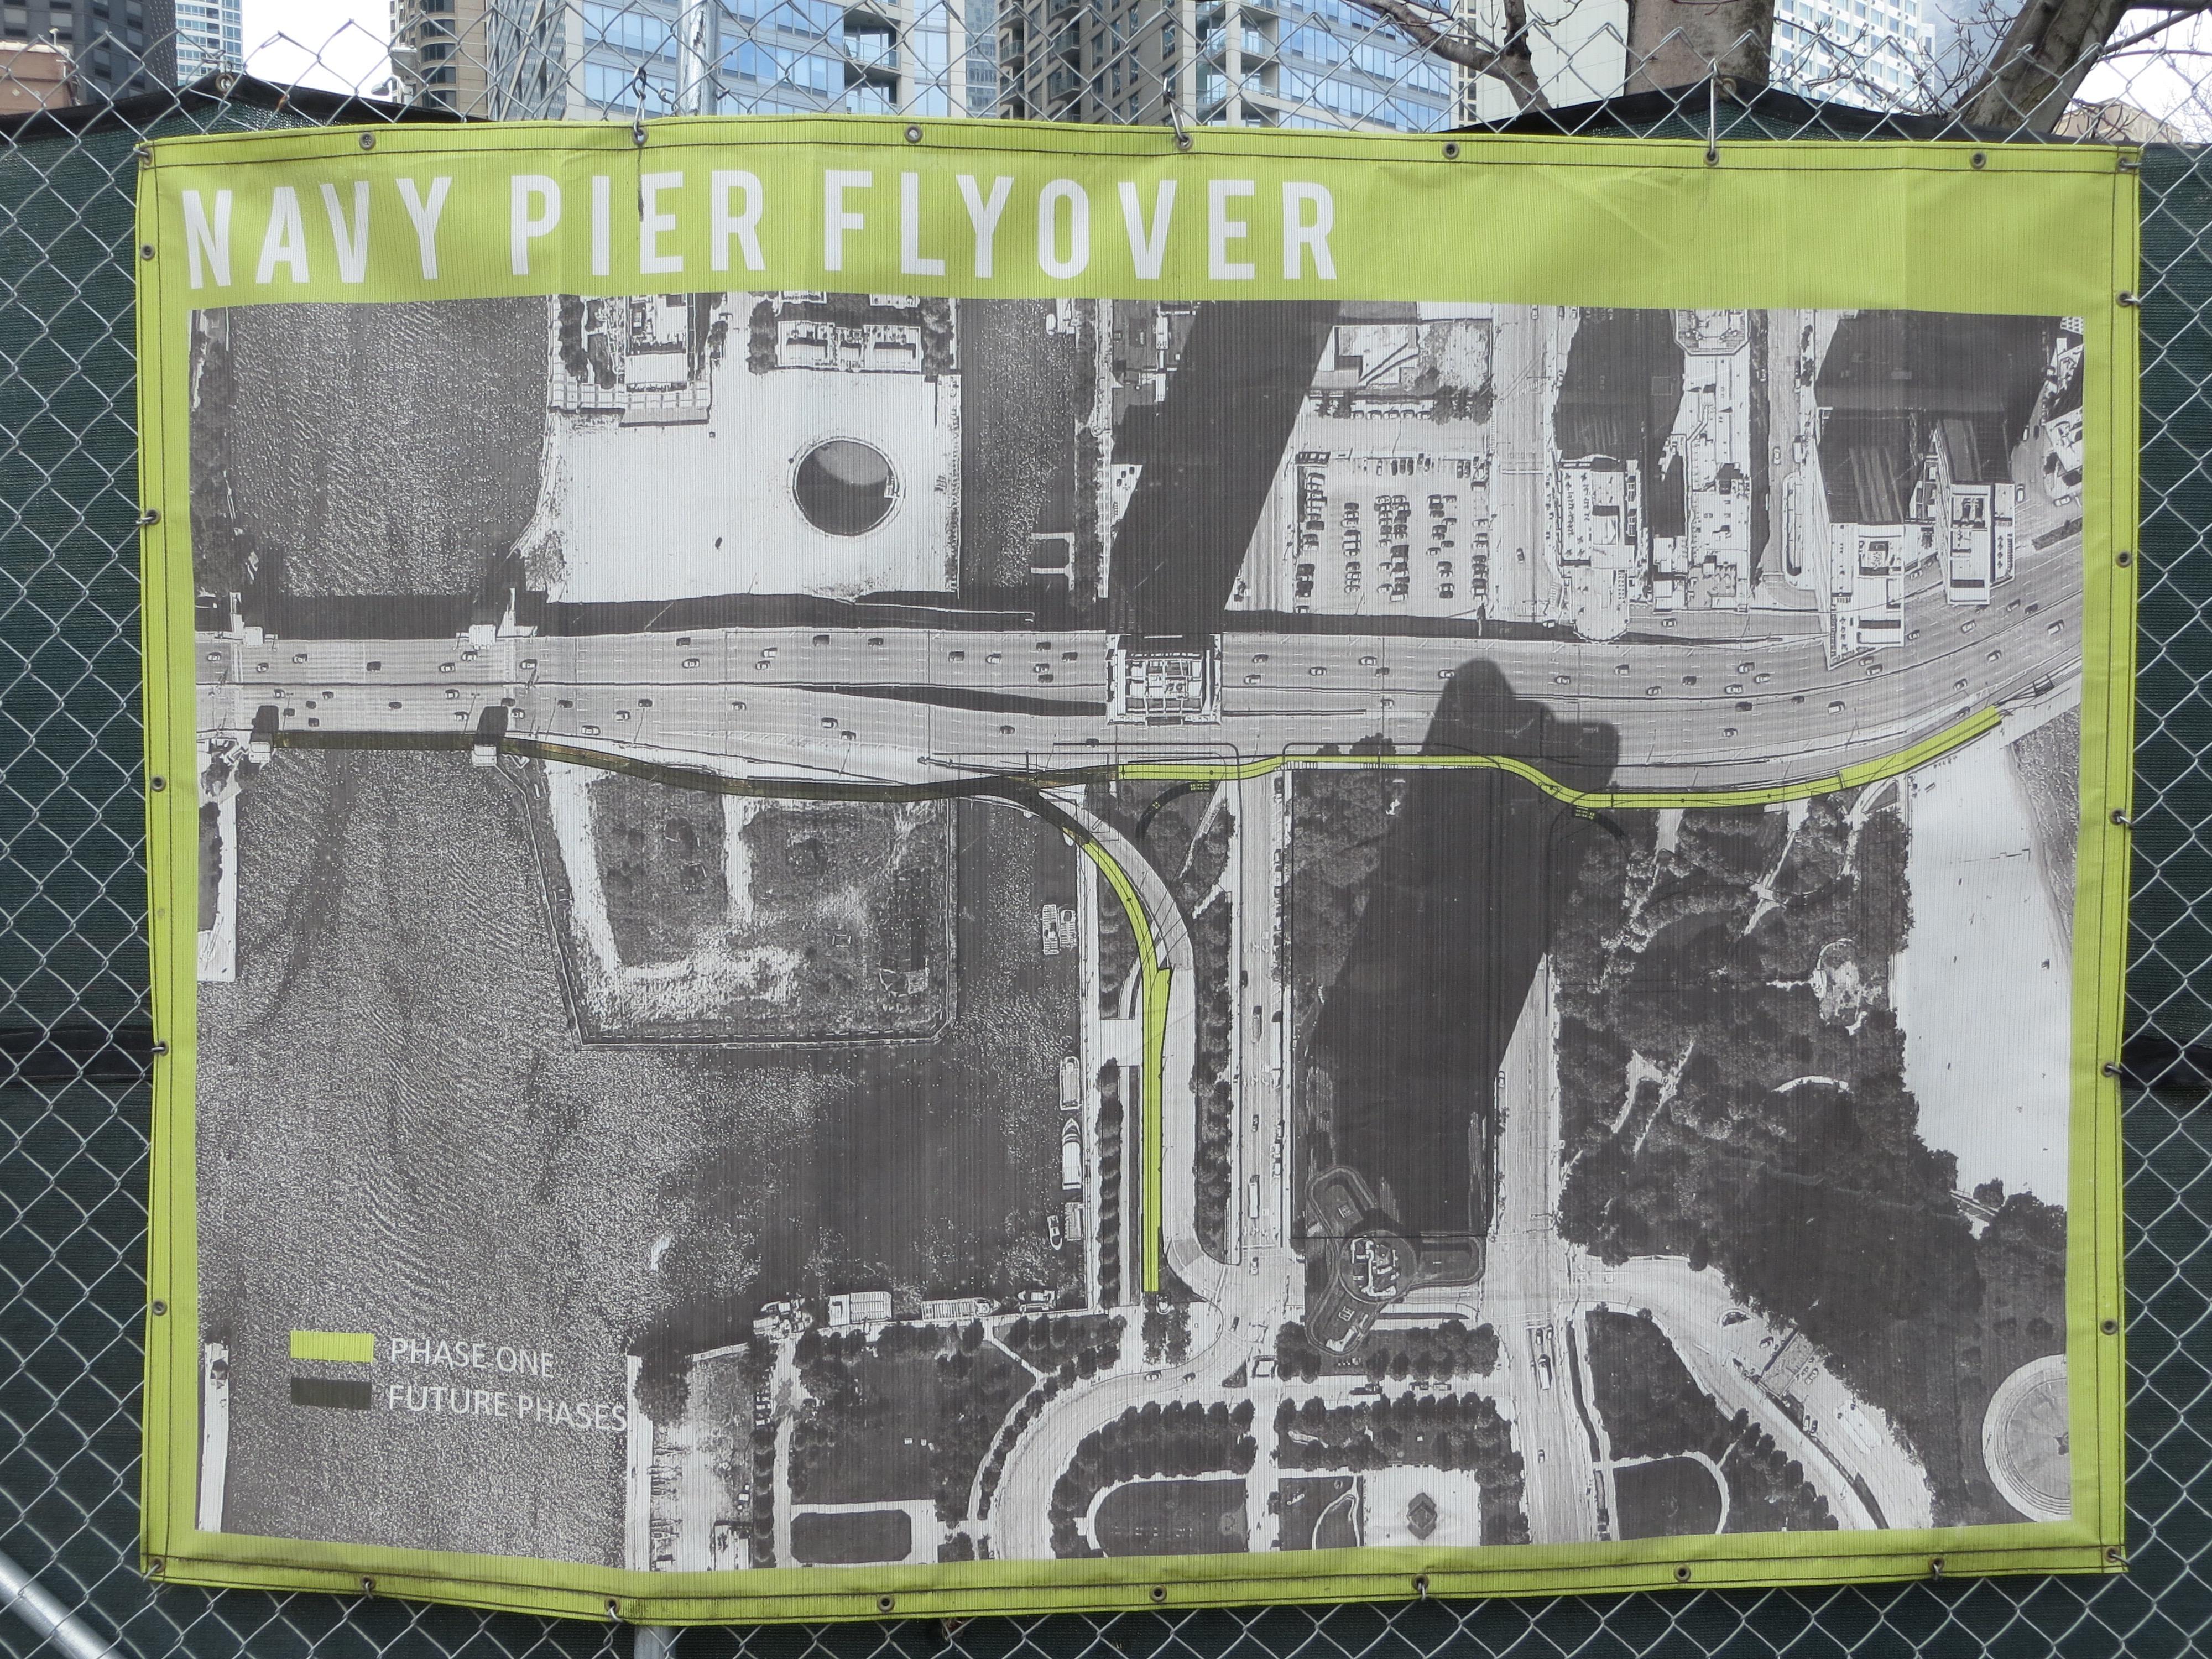 Construction Progressing On Navy Pier Flyover Project